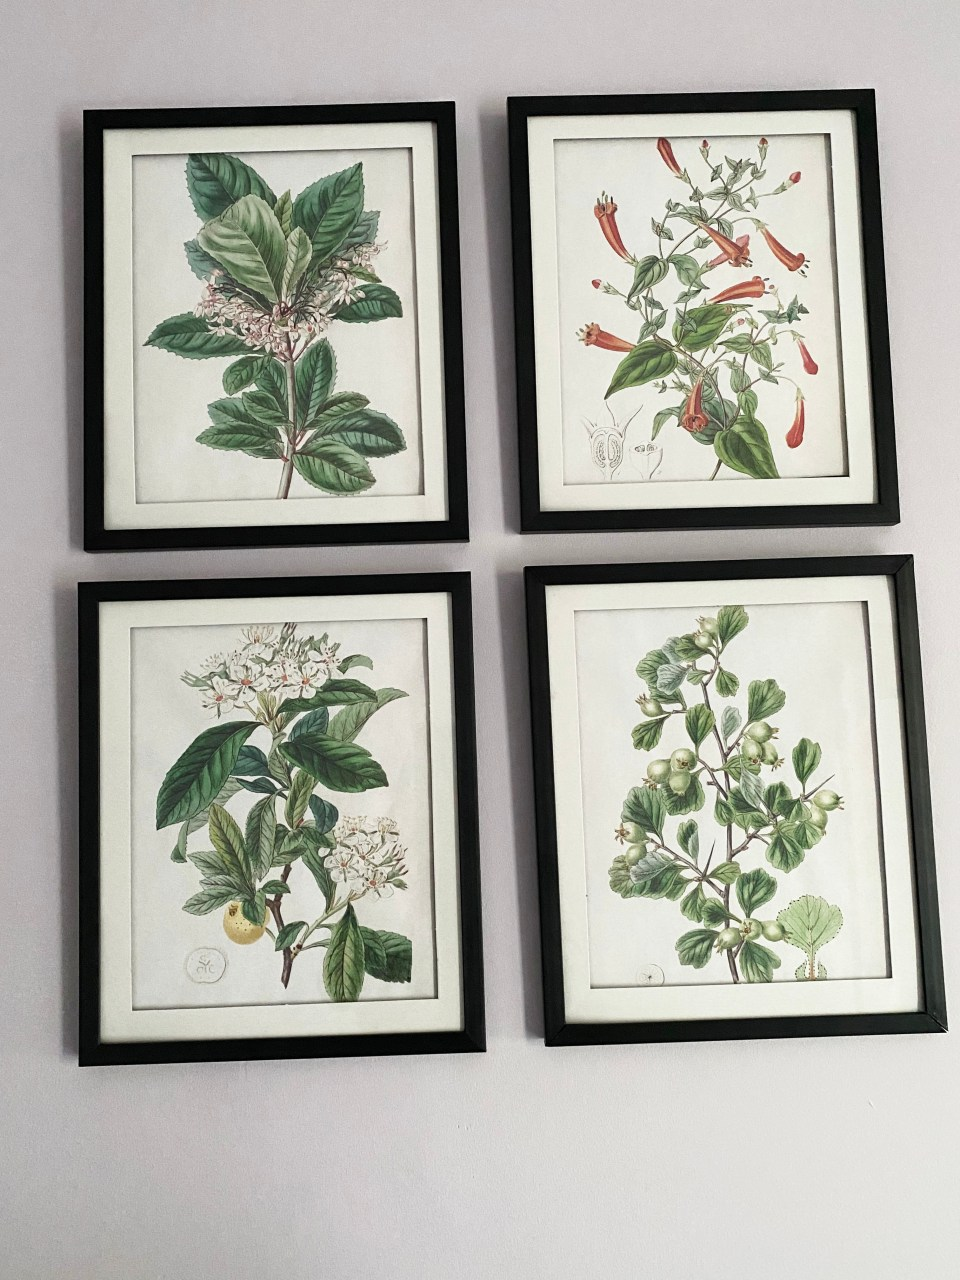 Vintage Floral Prints 2